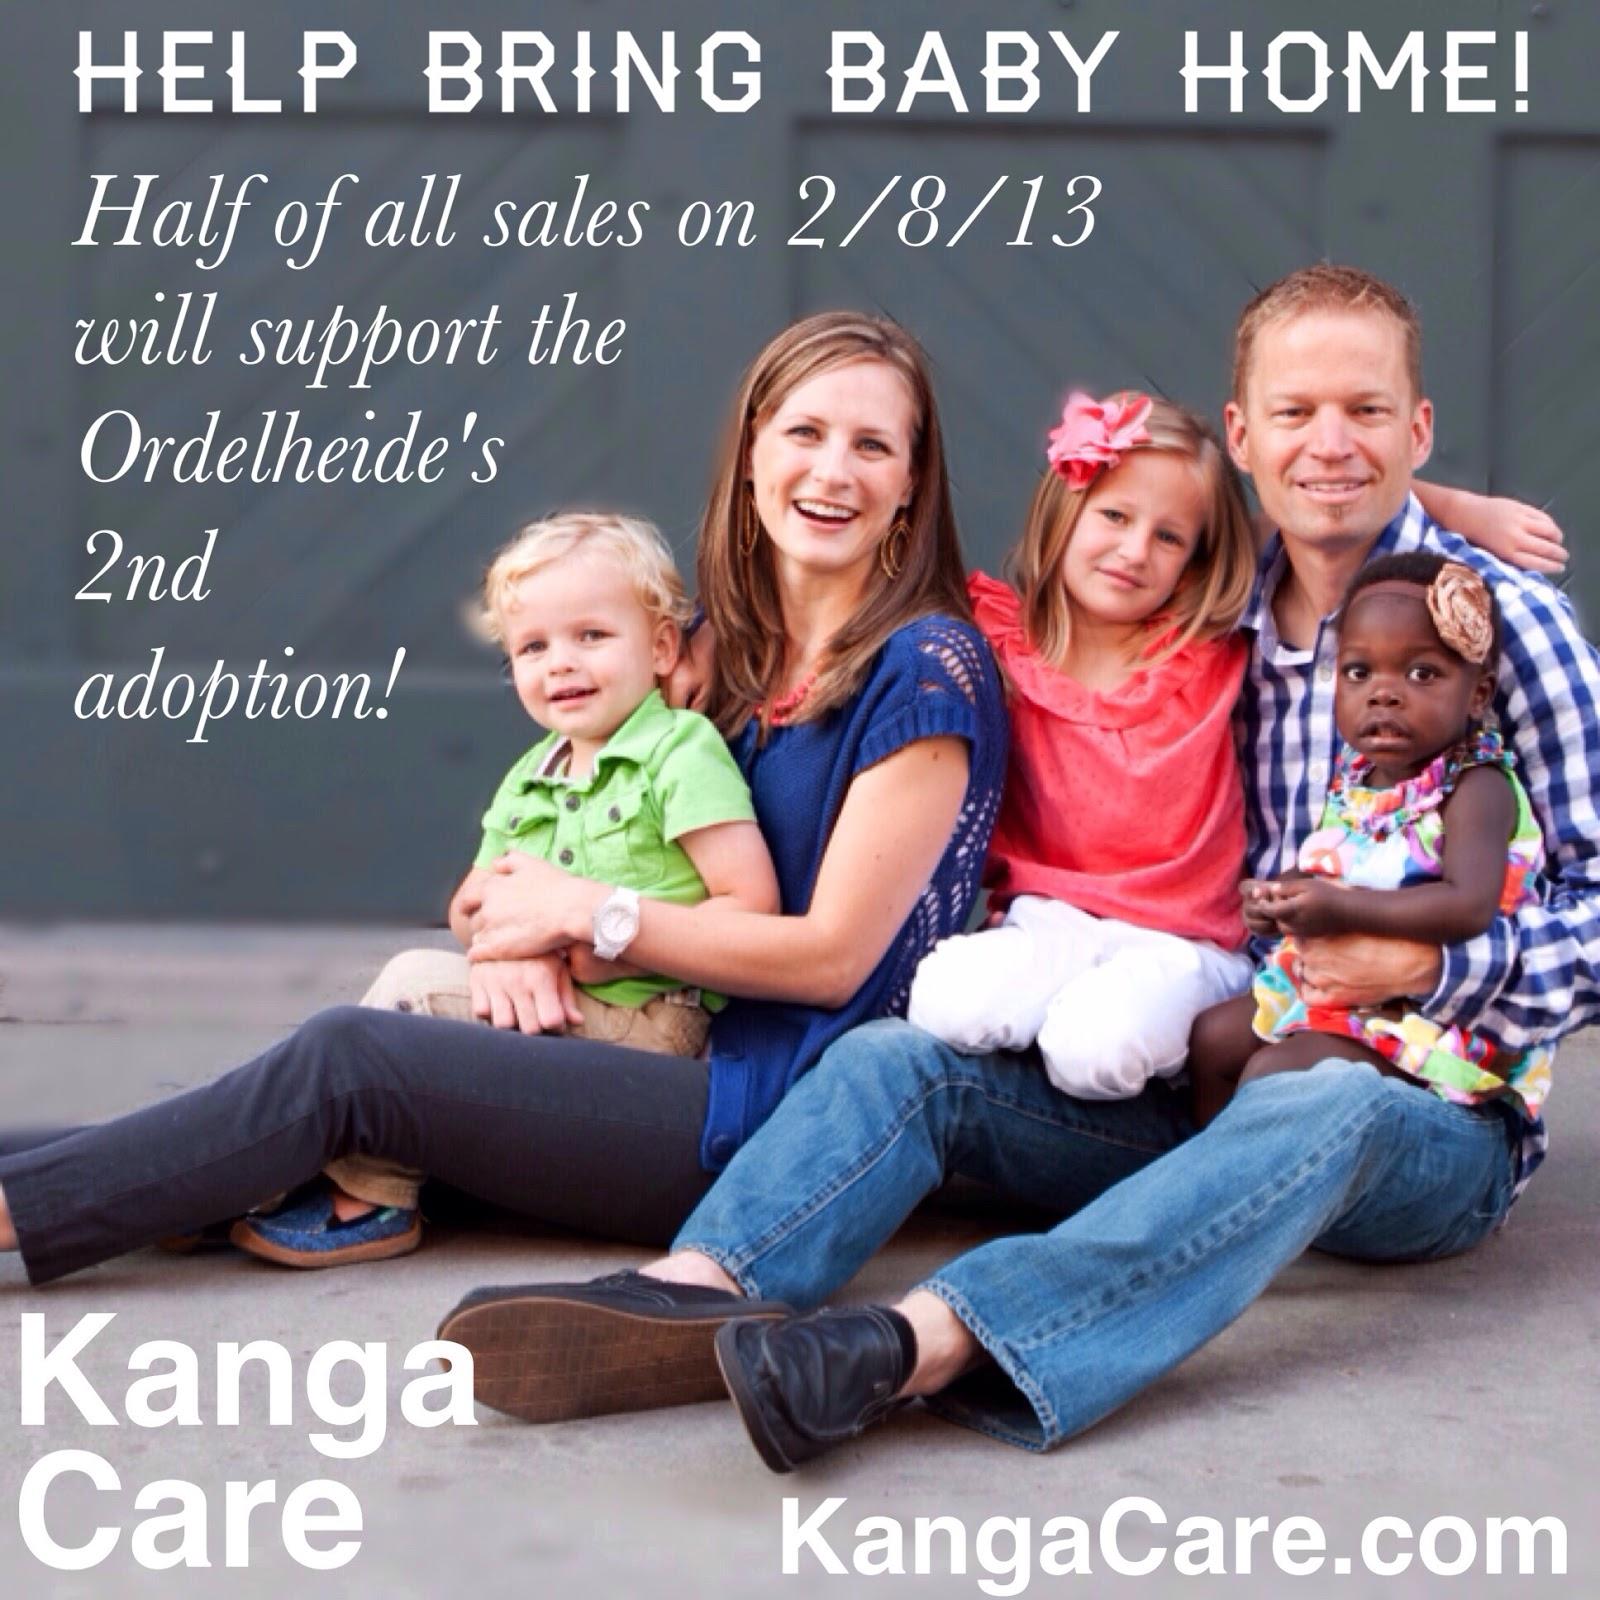 Help Bring Baby Home!